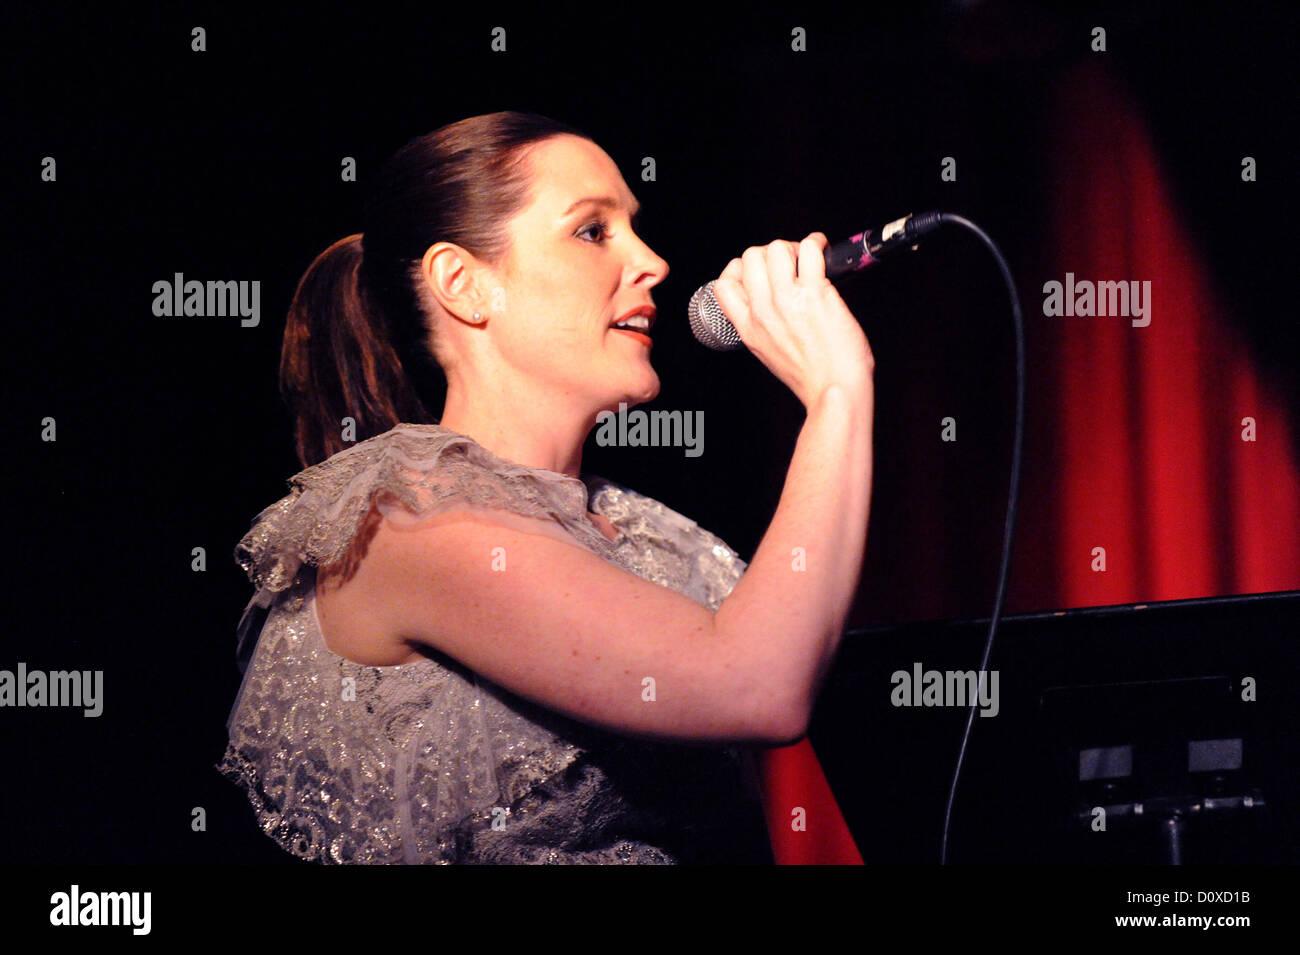 rachael macfarlane singer